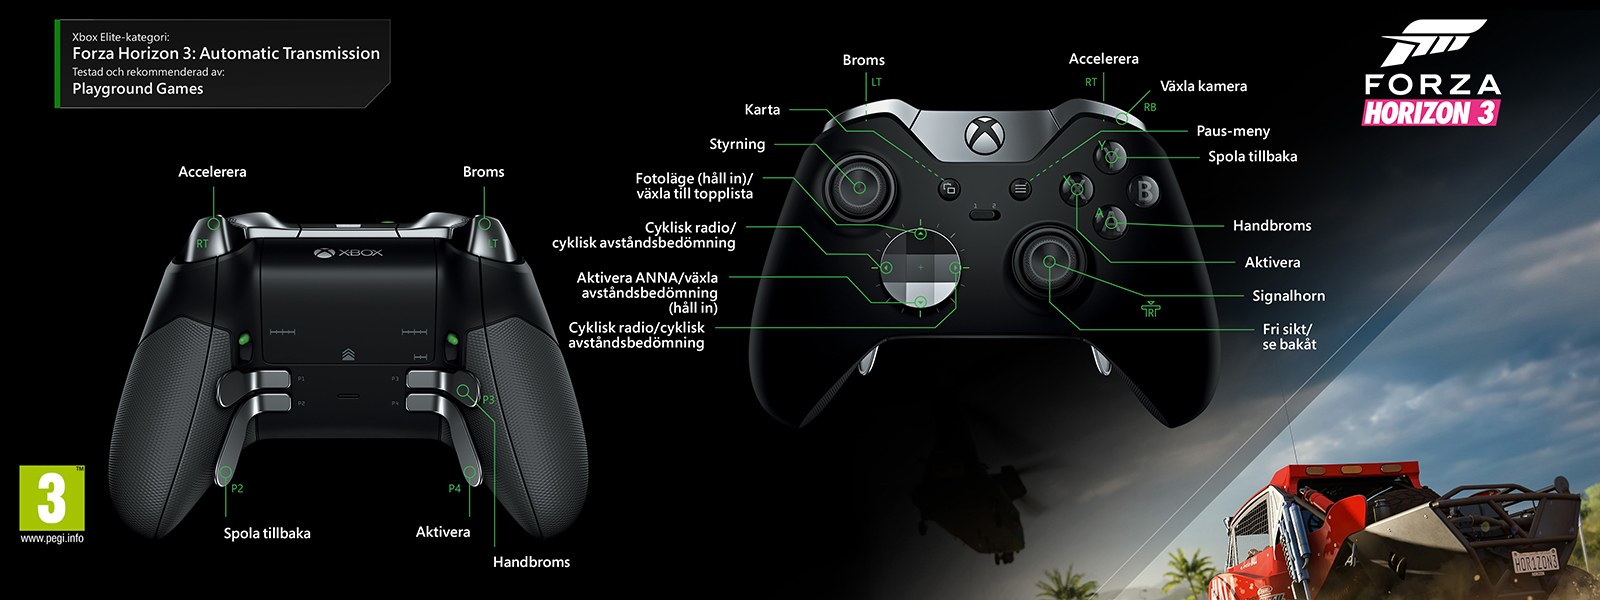 Forza Horizon 3 – Elite-mappning för automatväxellåda